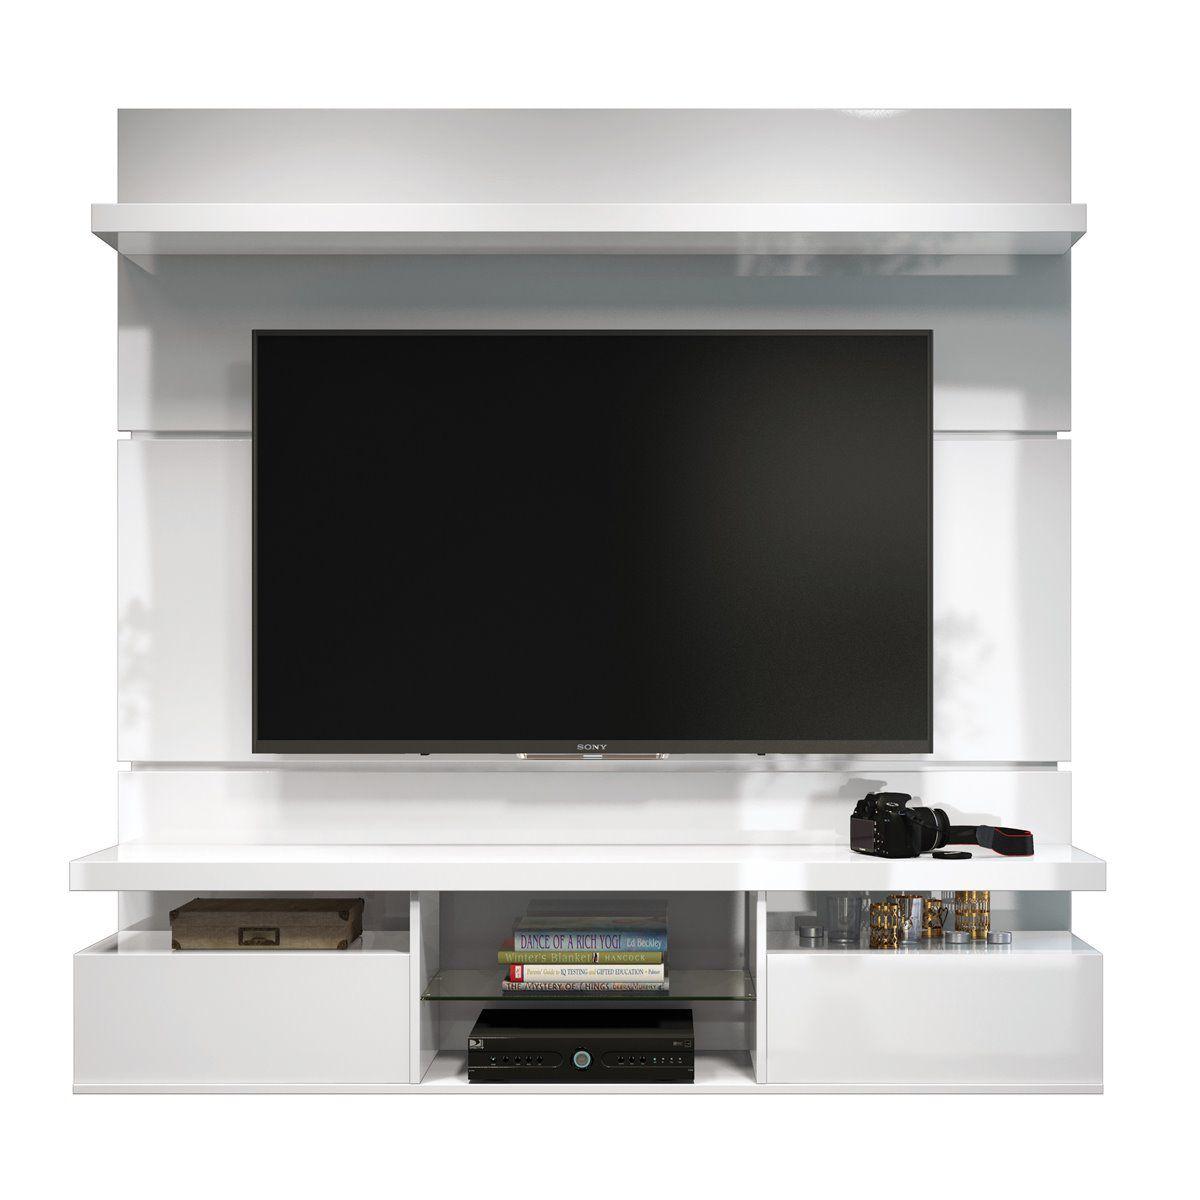 "Painel p/ TV 55"" Home Suspenso Livin 1.8 HB Móveis Branco"